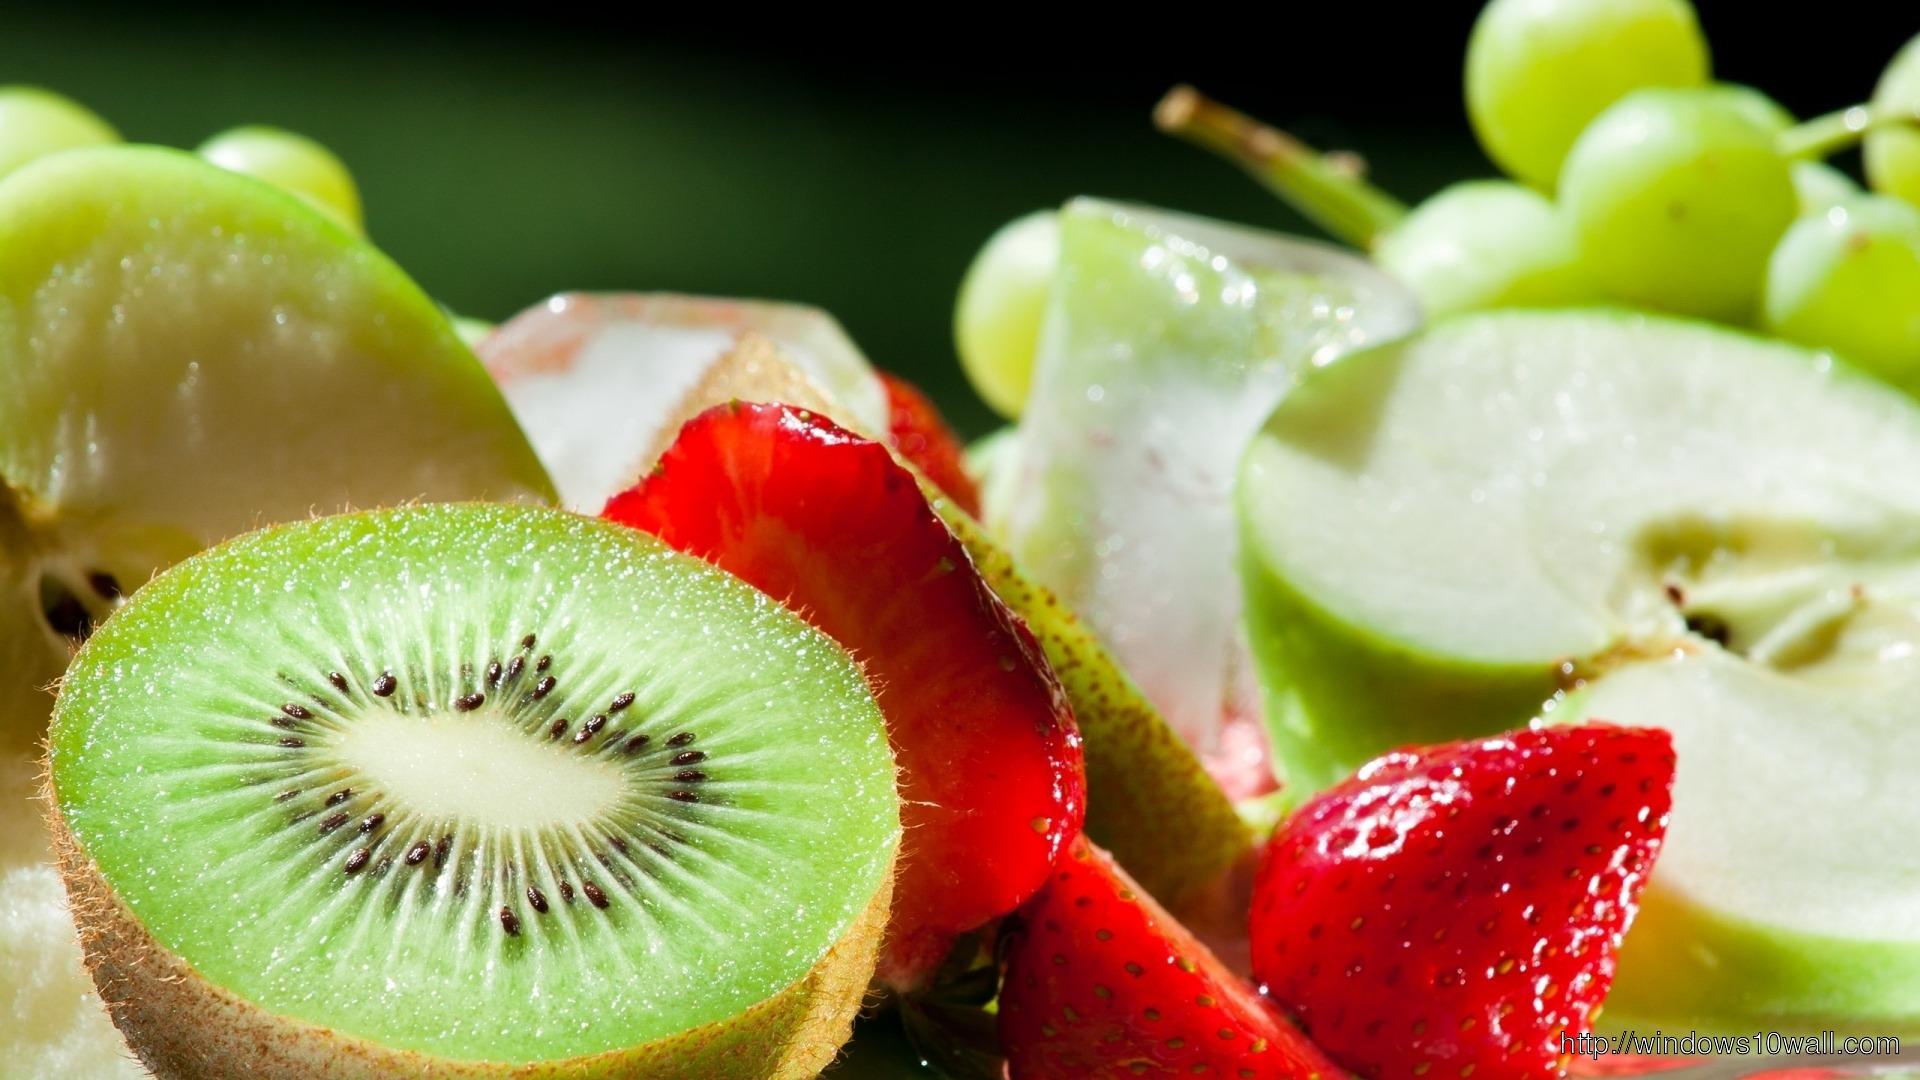 Cute Fruits Wallpaper